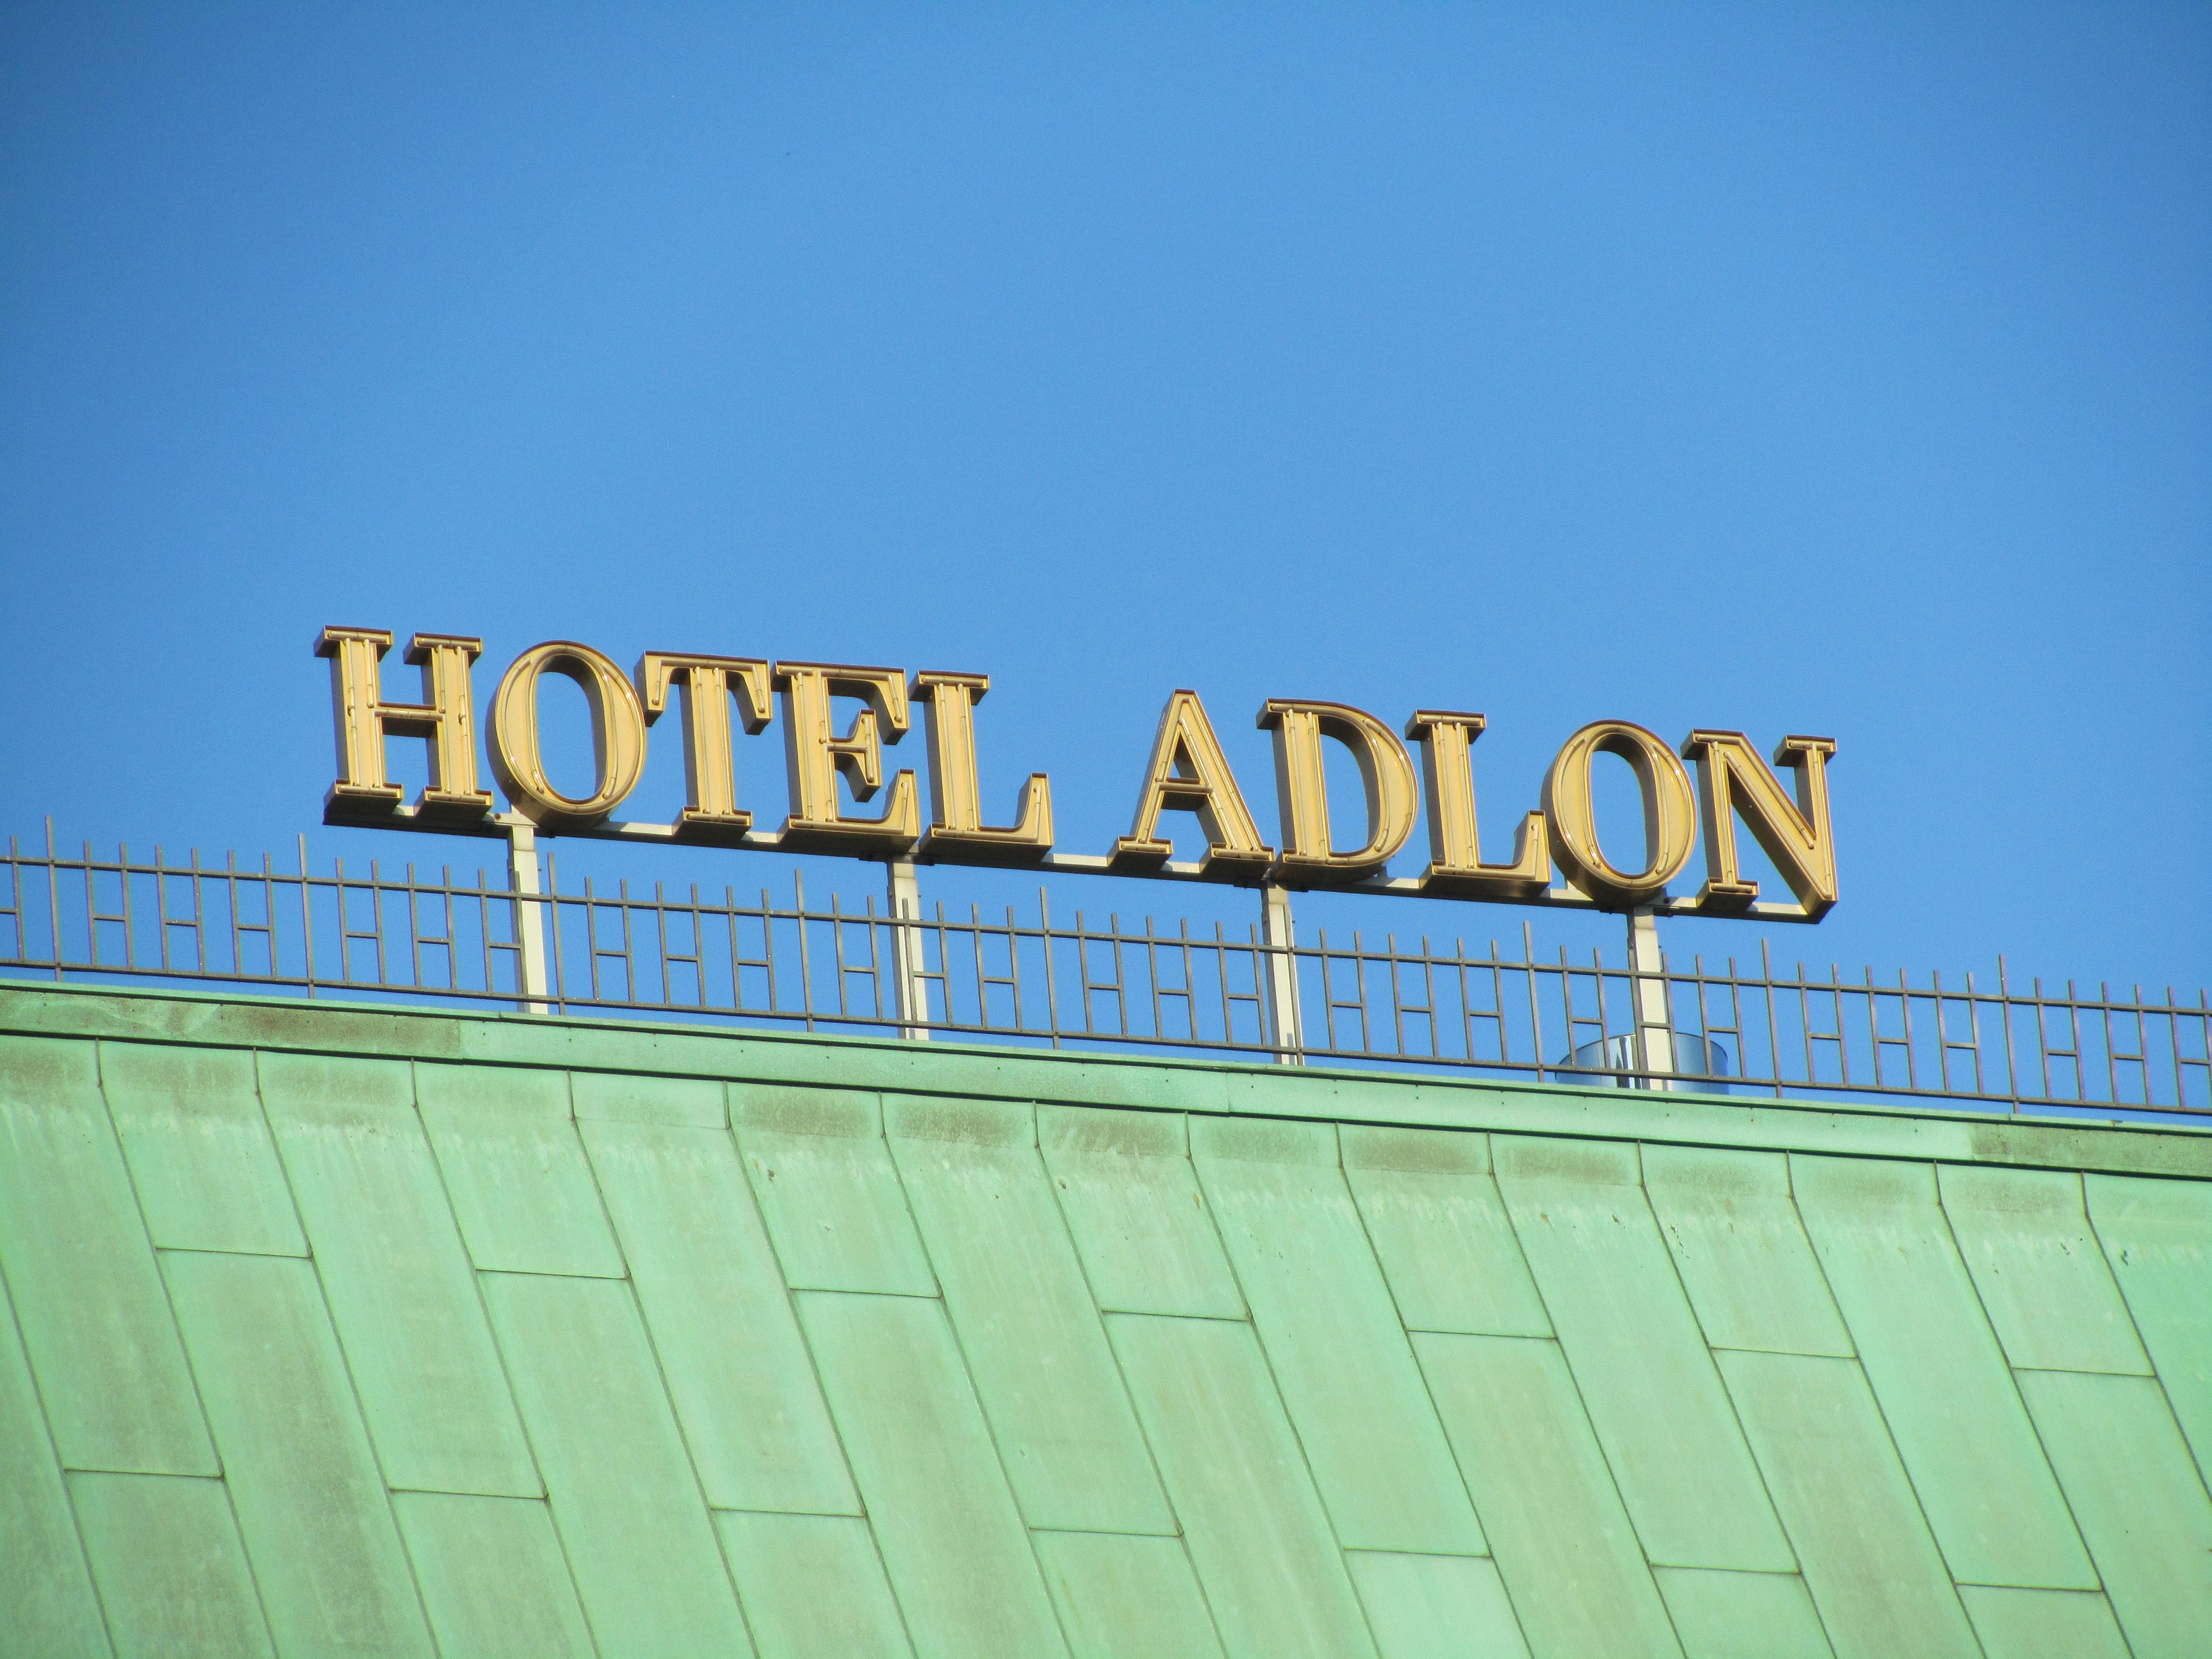 Schriftzug auf dem Dach des Hotels